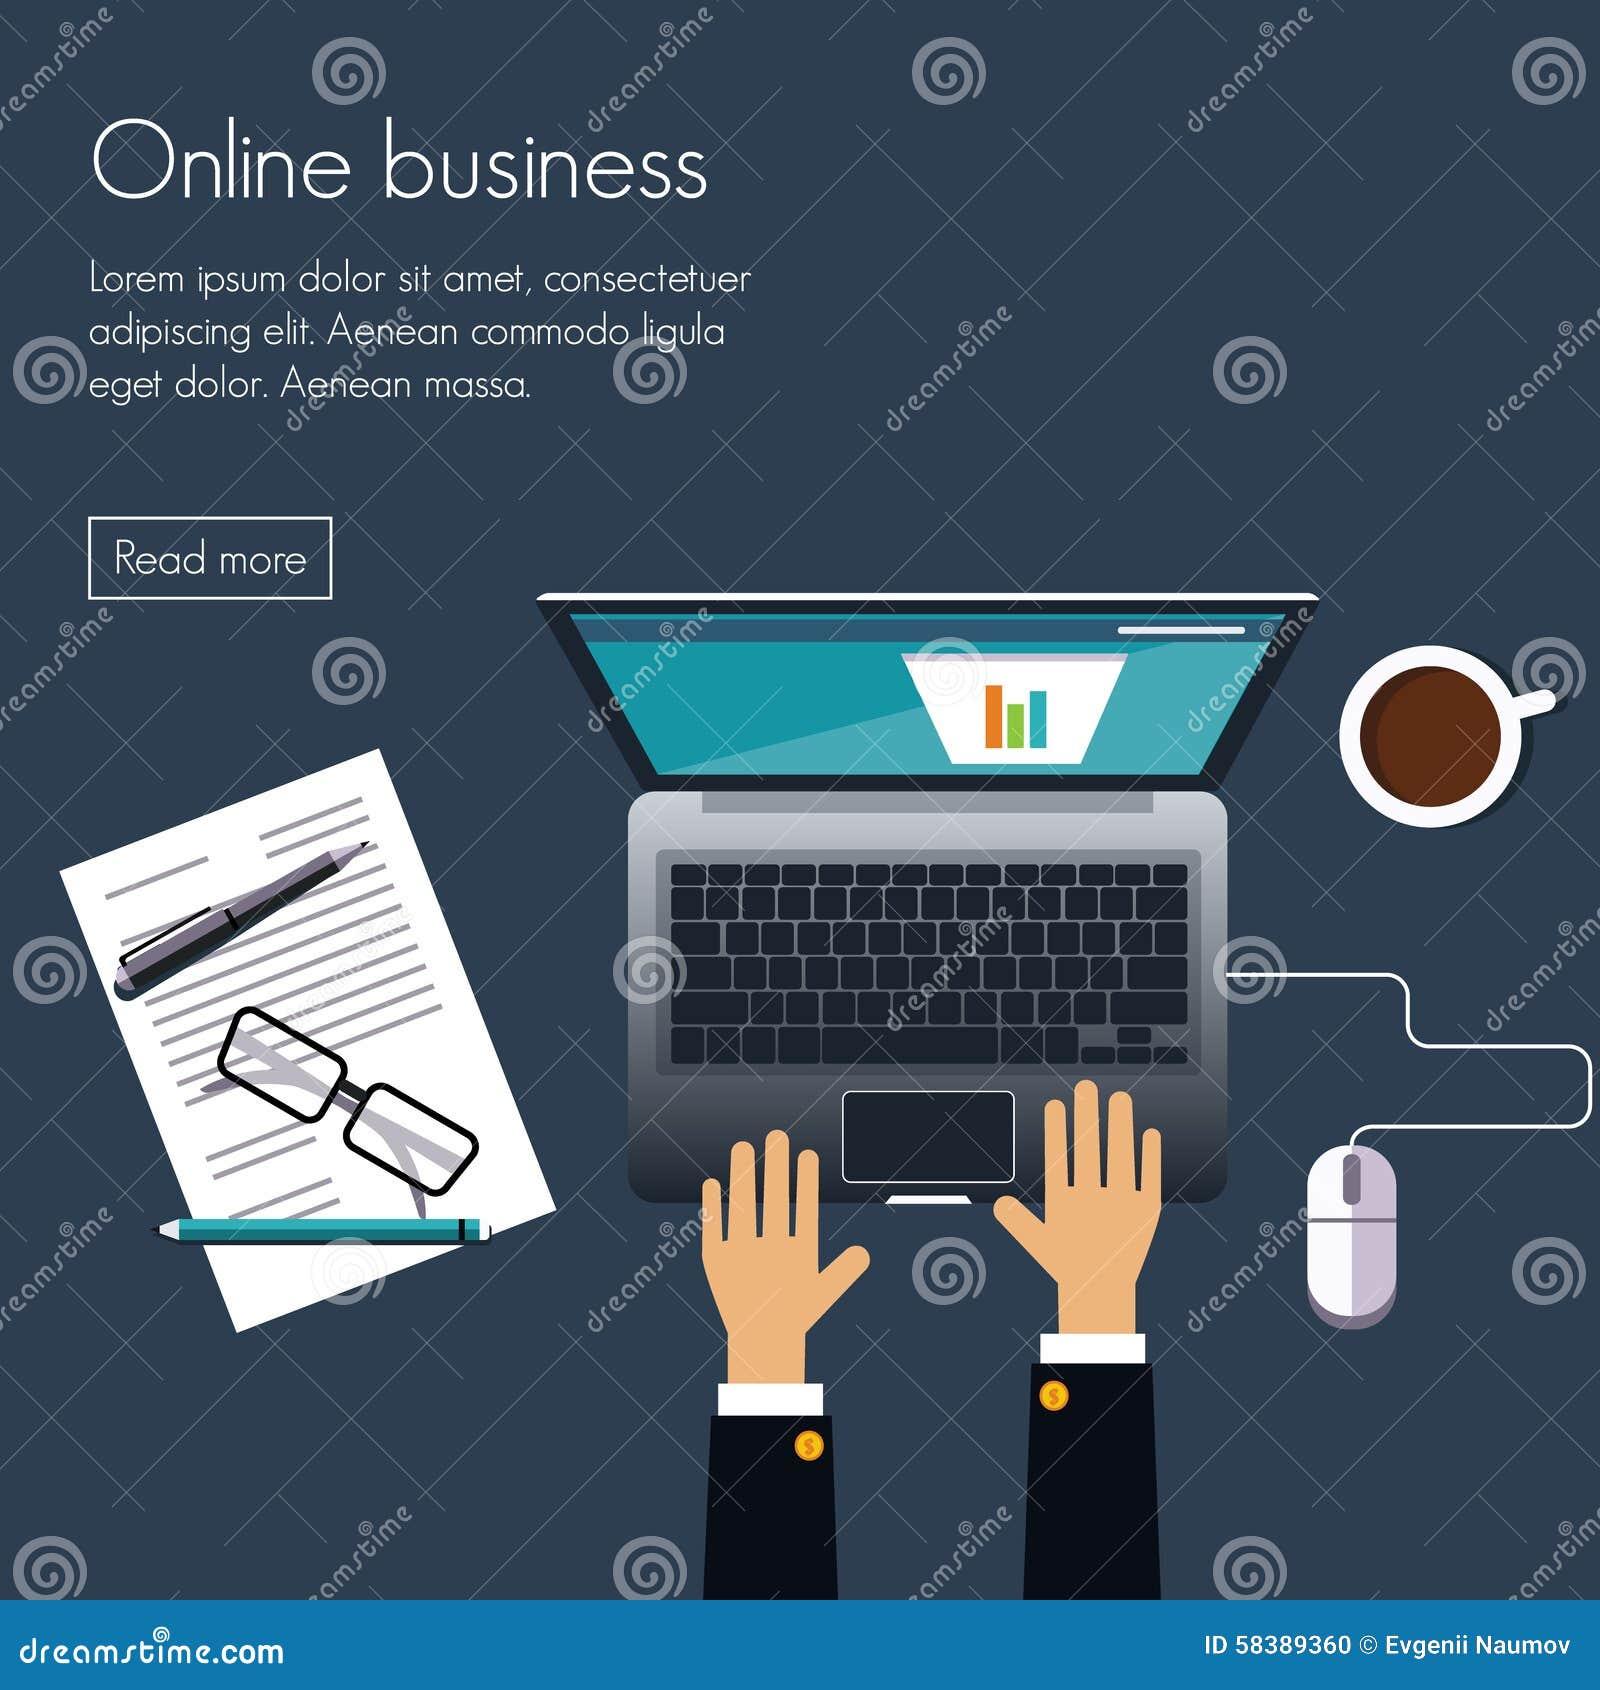 Online Business Stock Vector - Image: 58389360